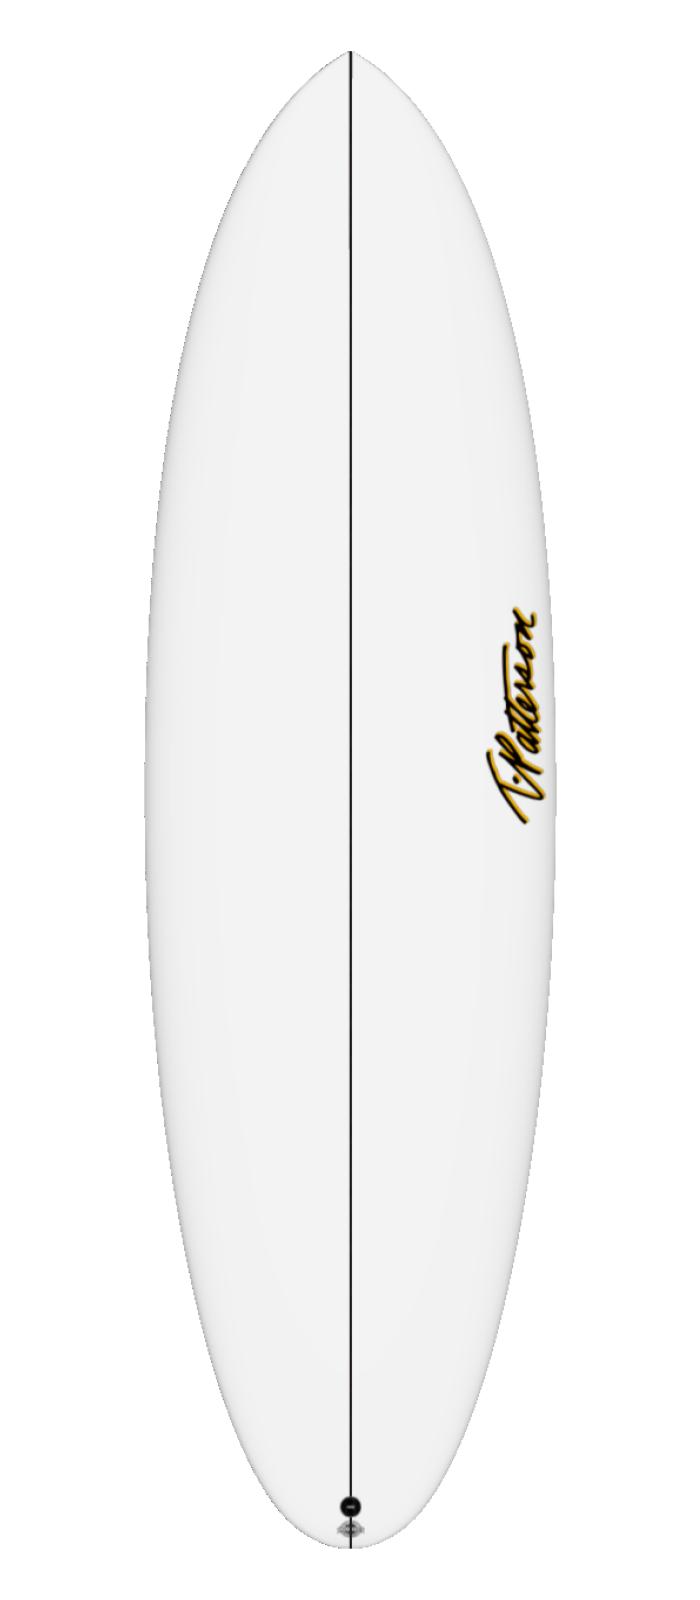 FULL MOON surfboard model